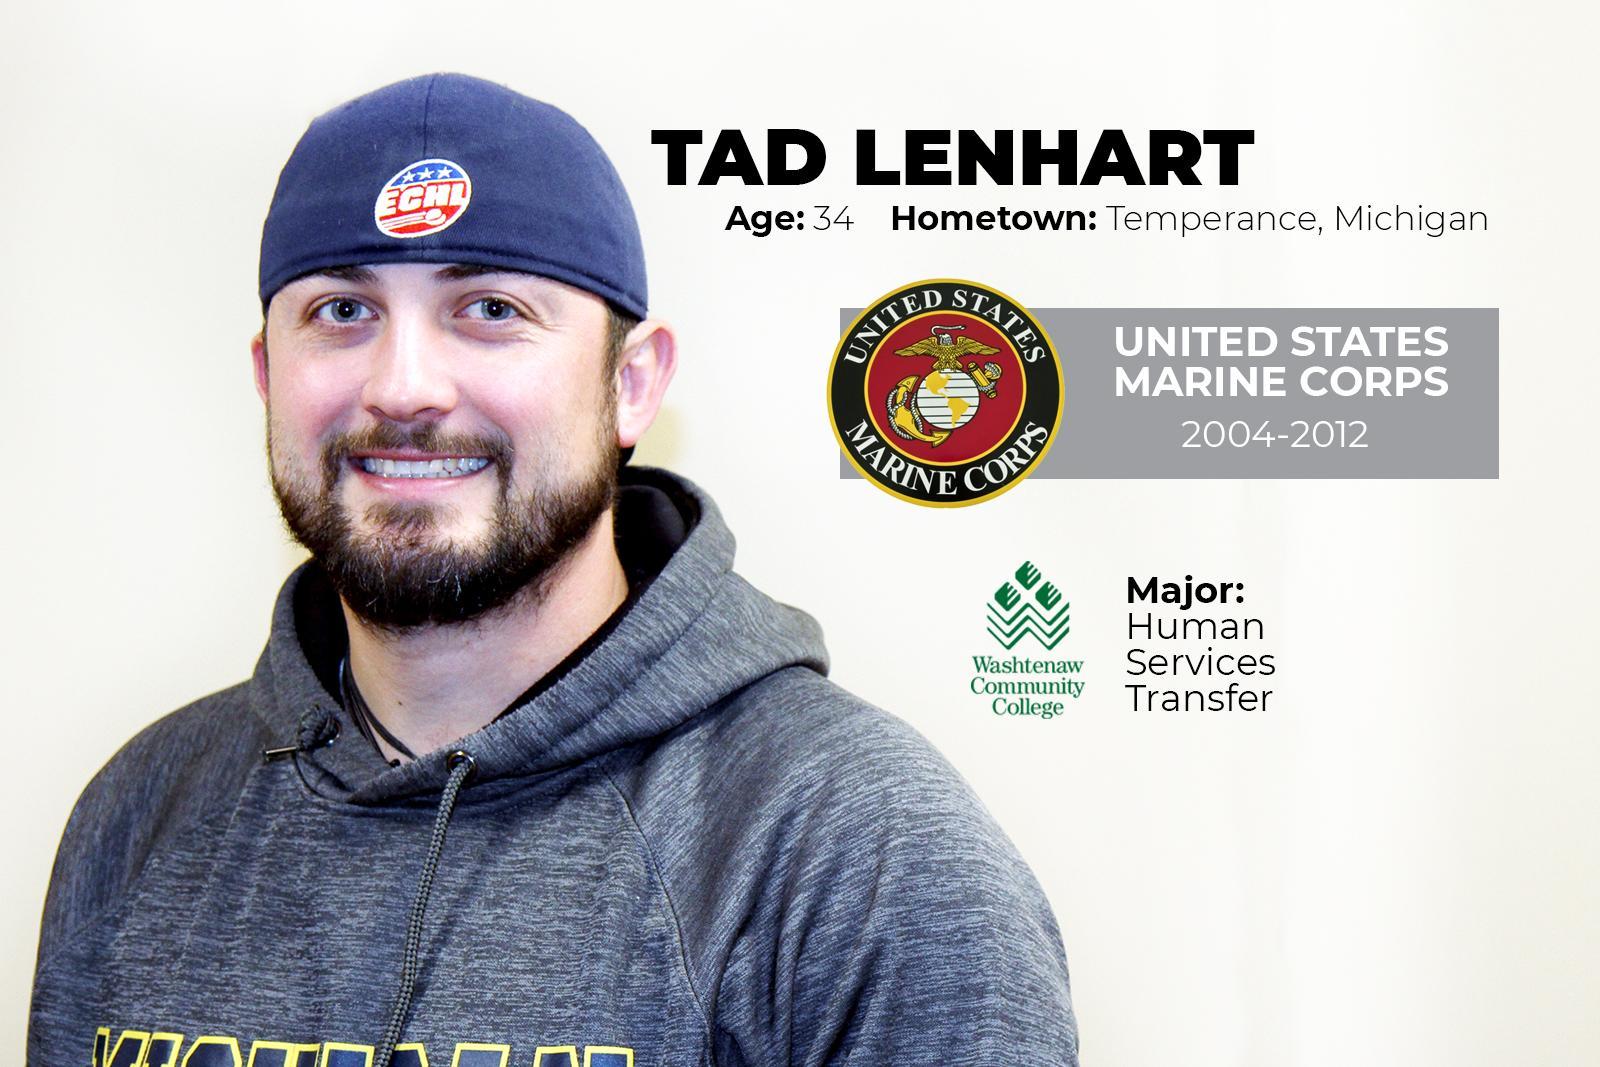 Tad Lenhart